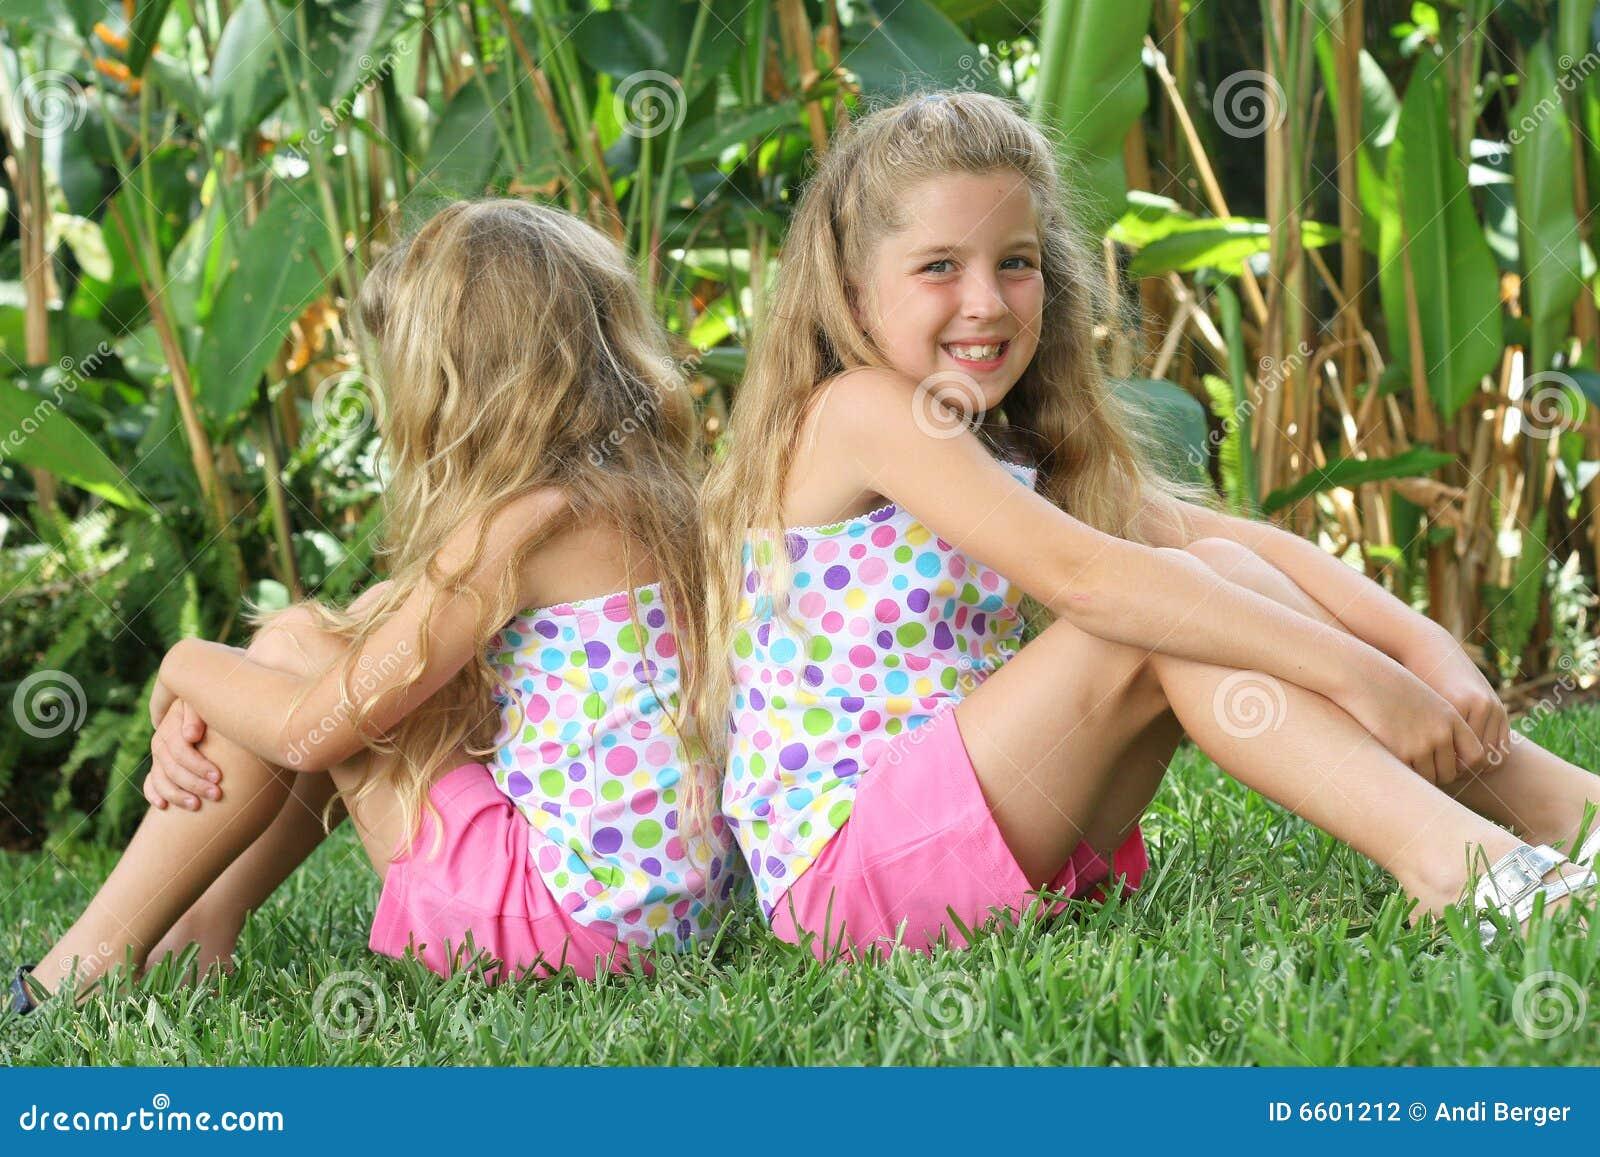 Back to back twins outside